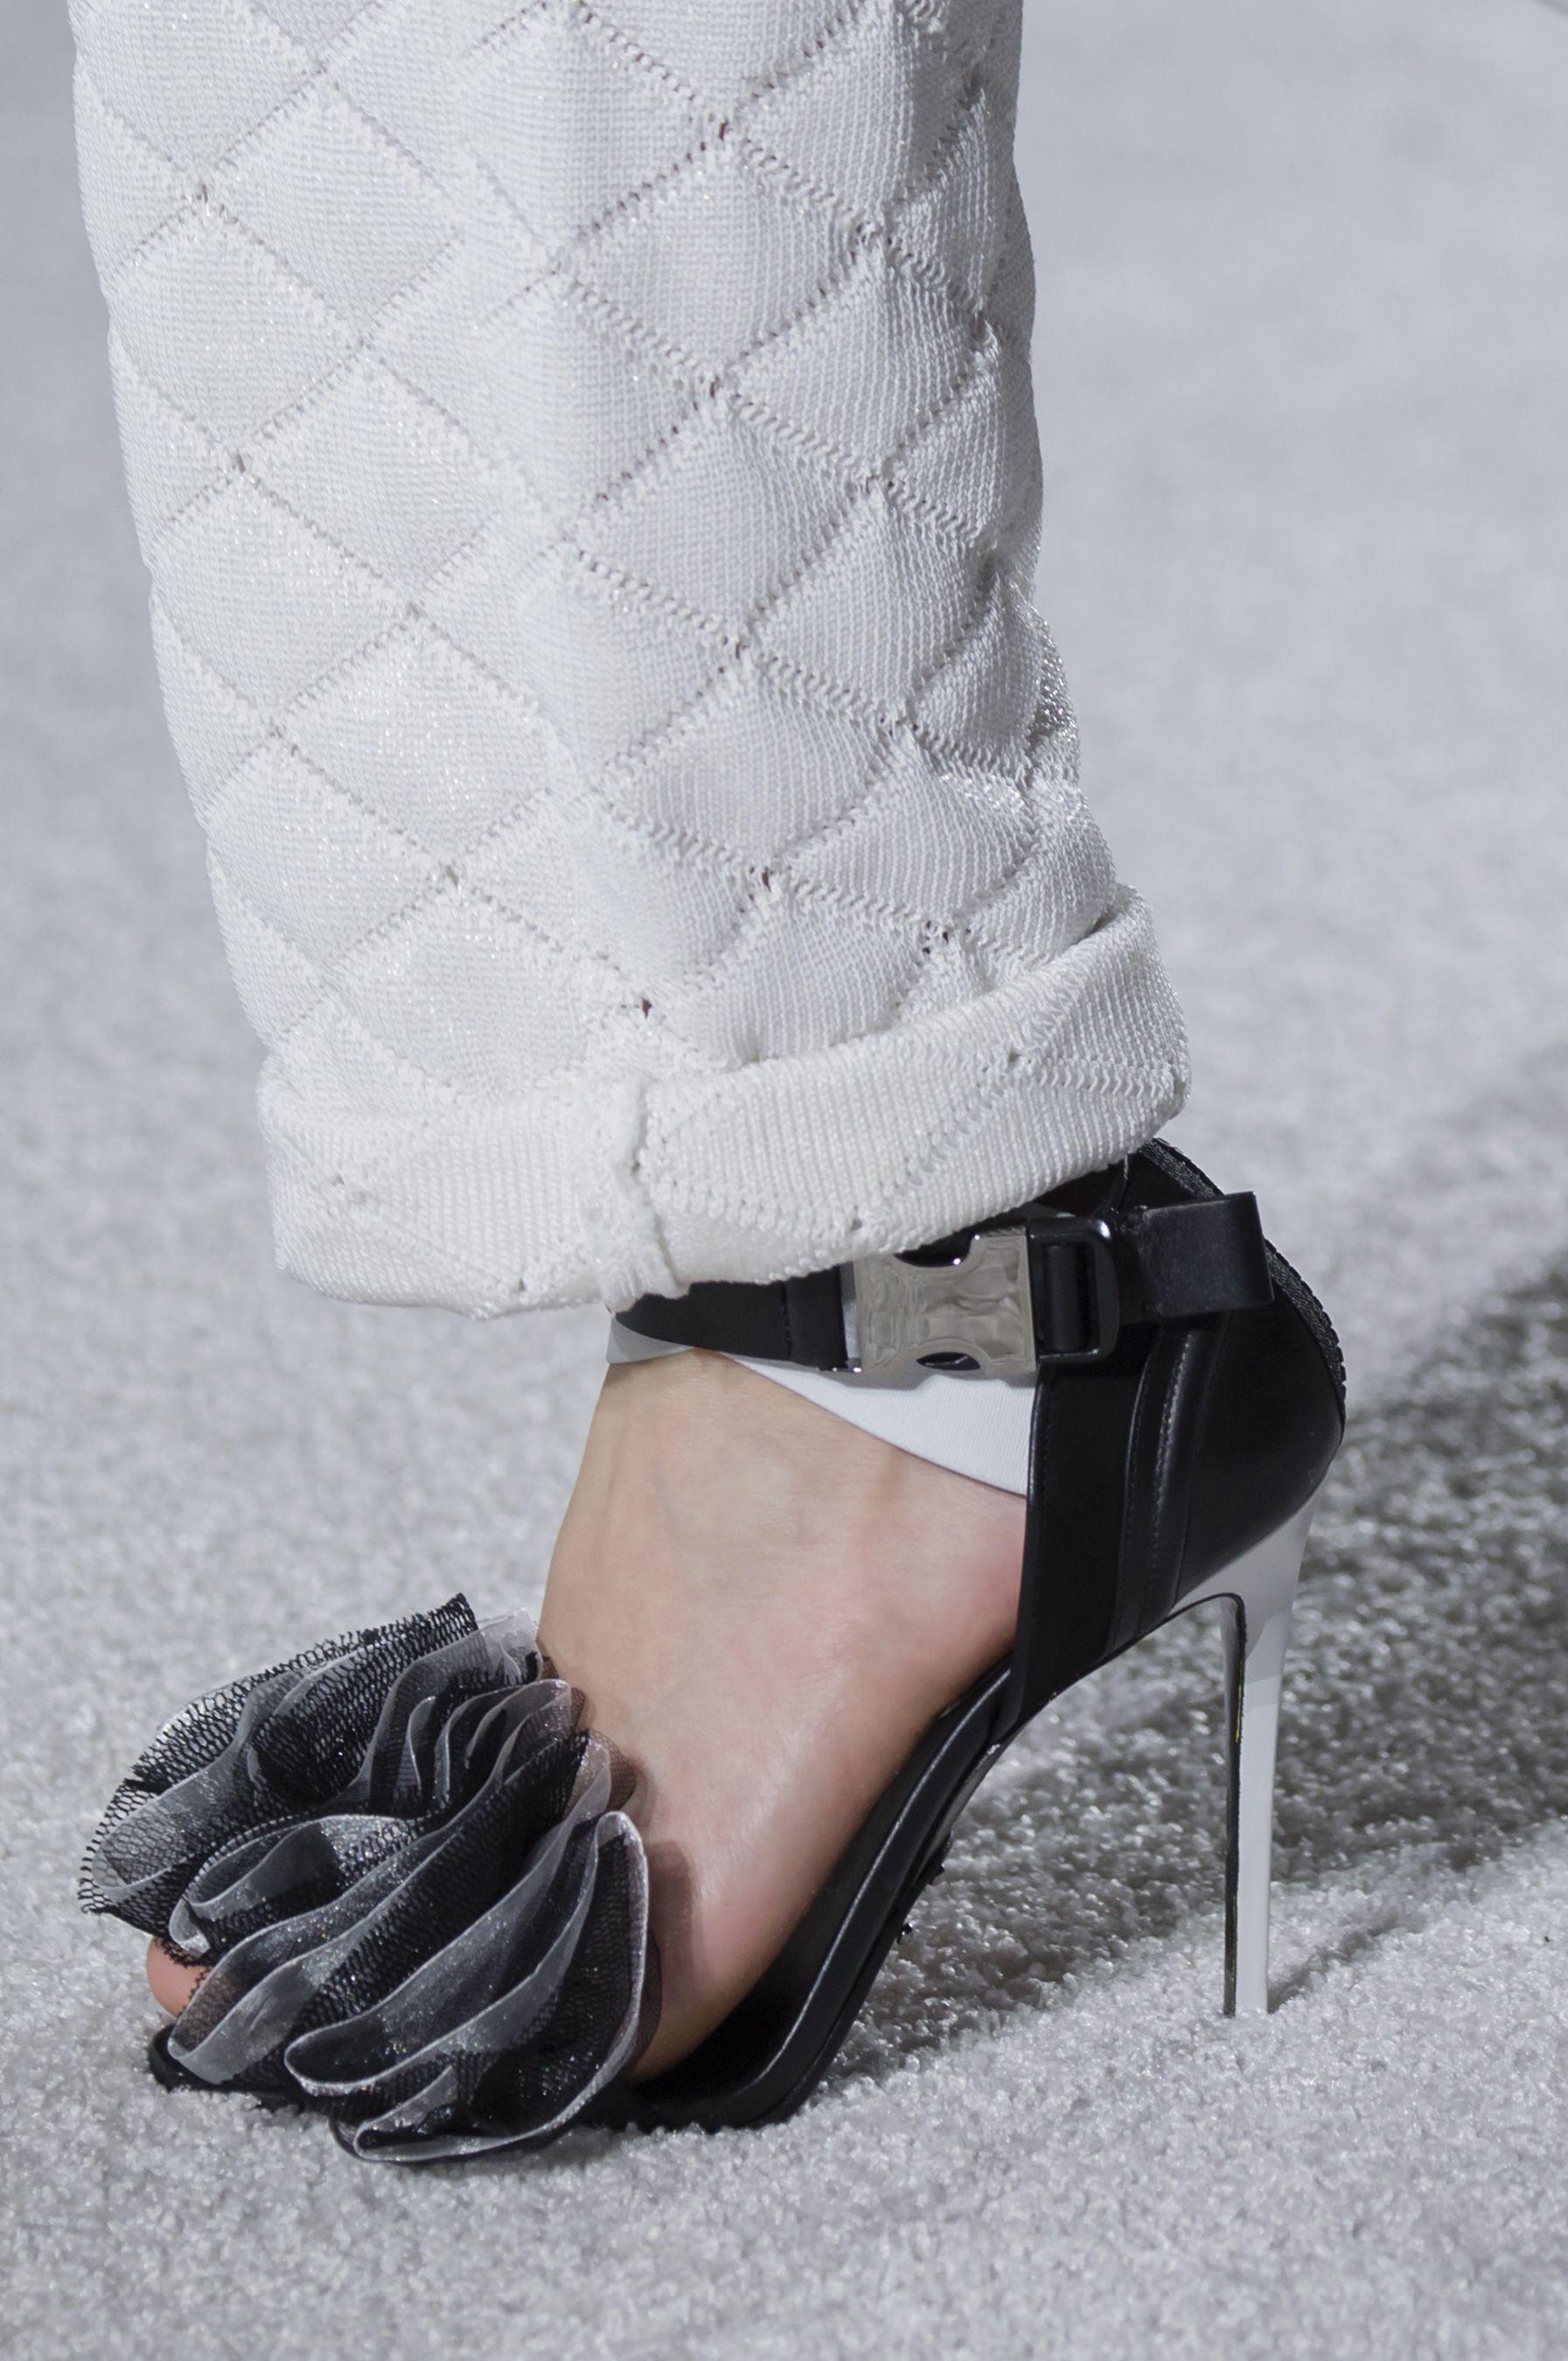 5e56bd7c307e47 Balmain Fall 2018 Fashion Show Details - The Impression Bling Shoes